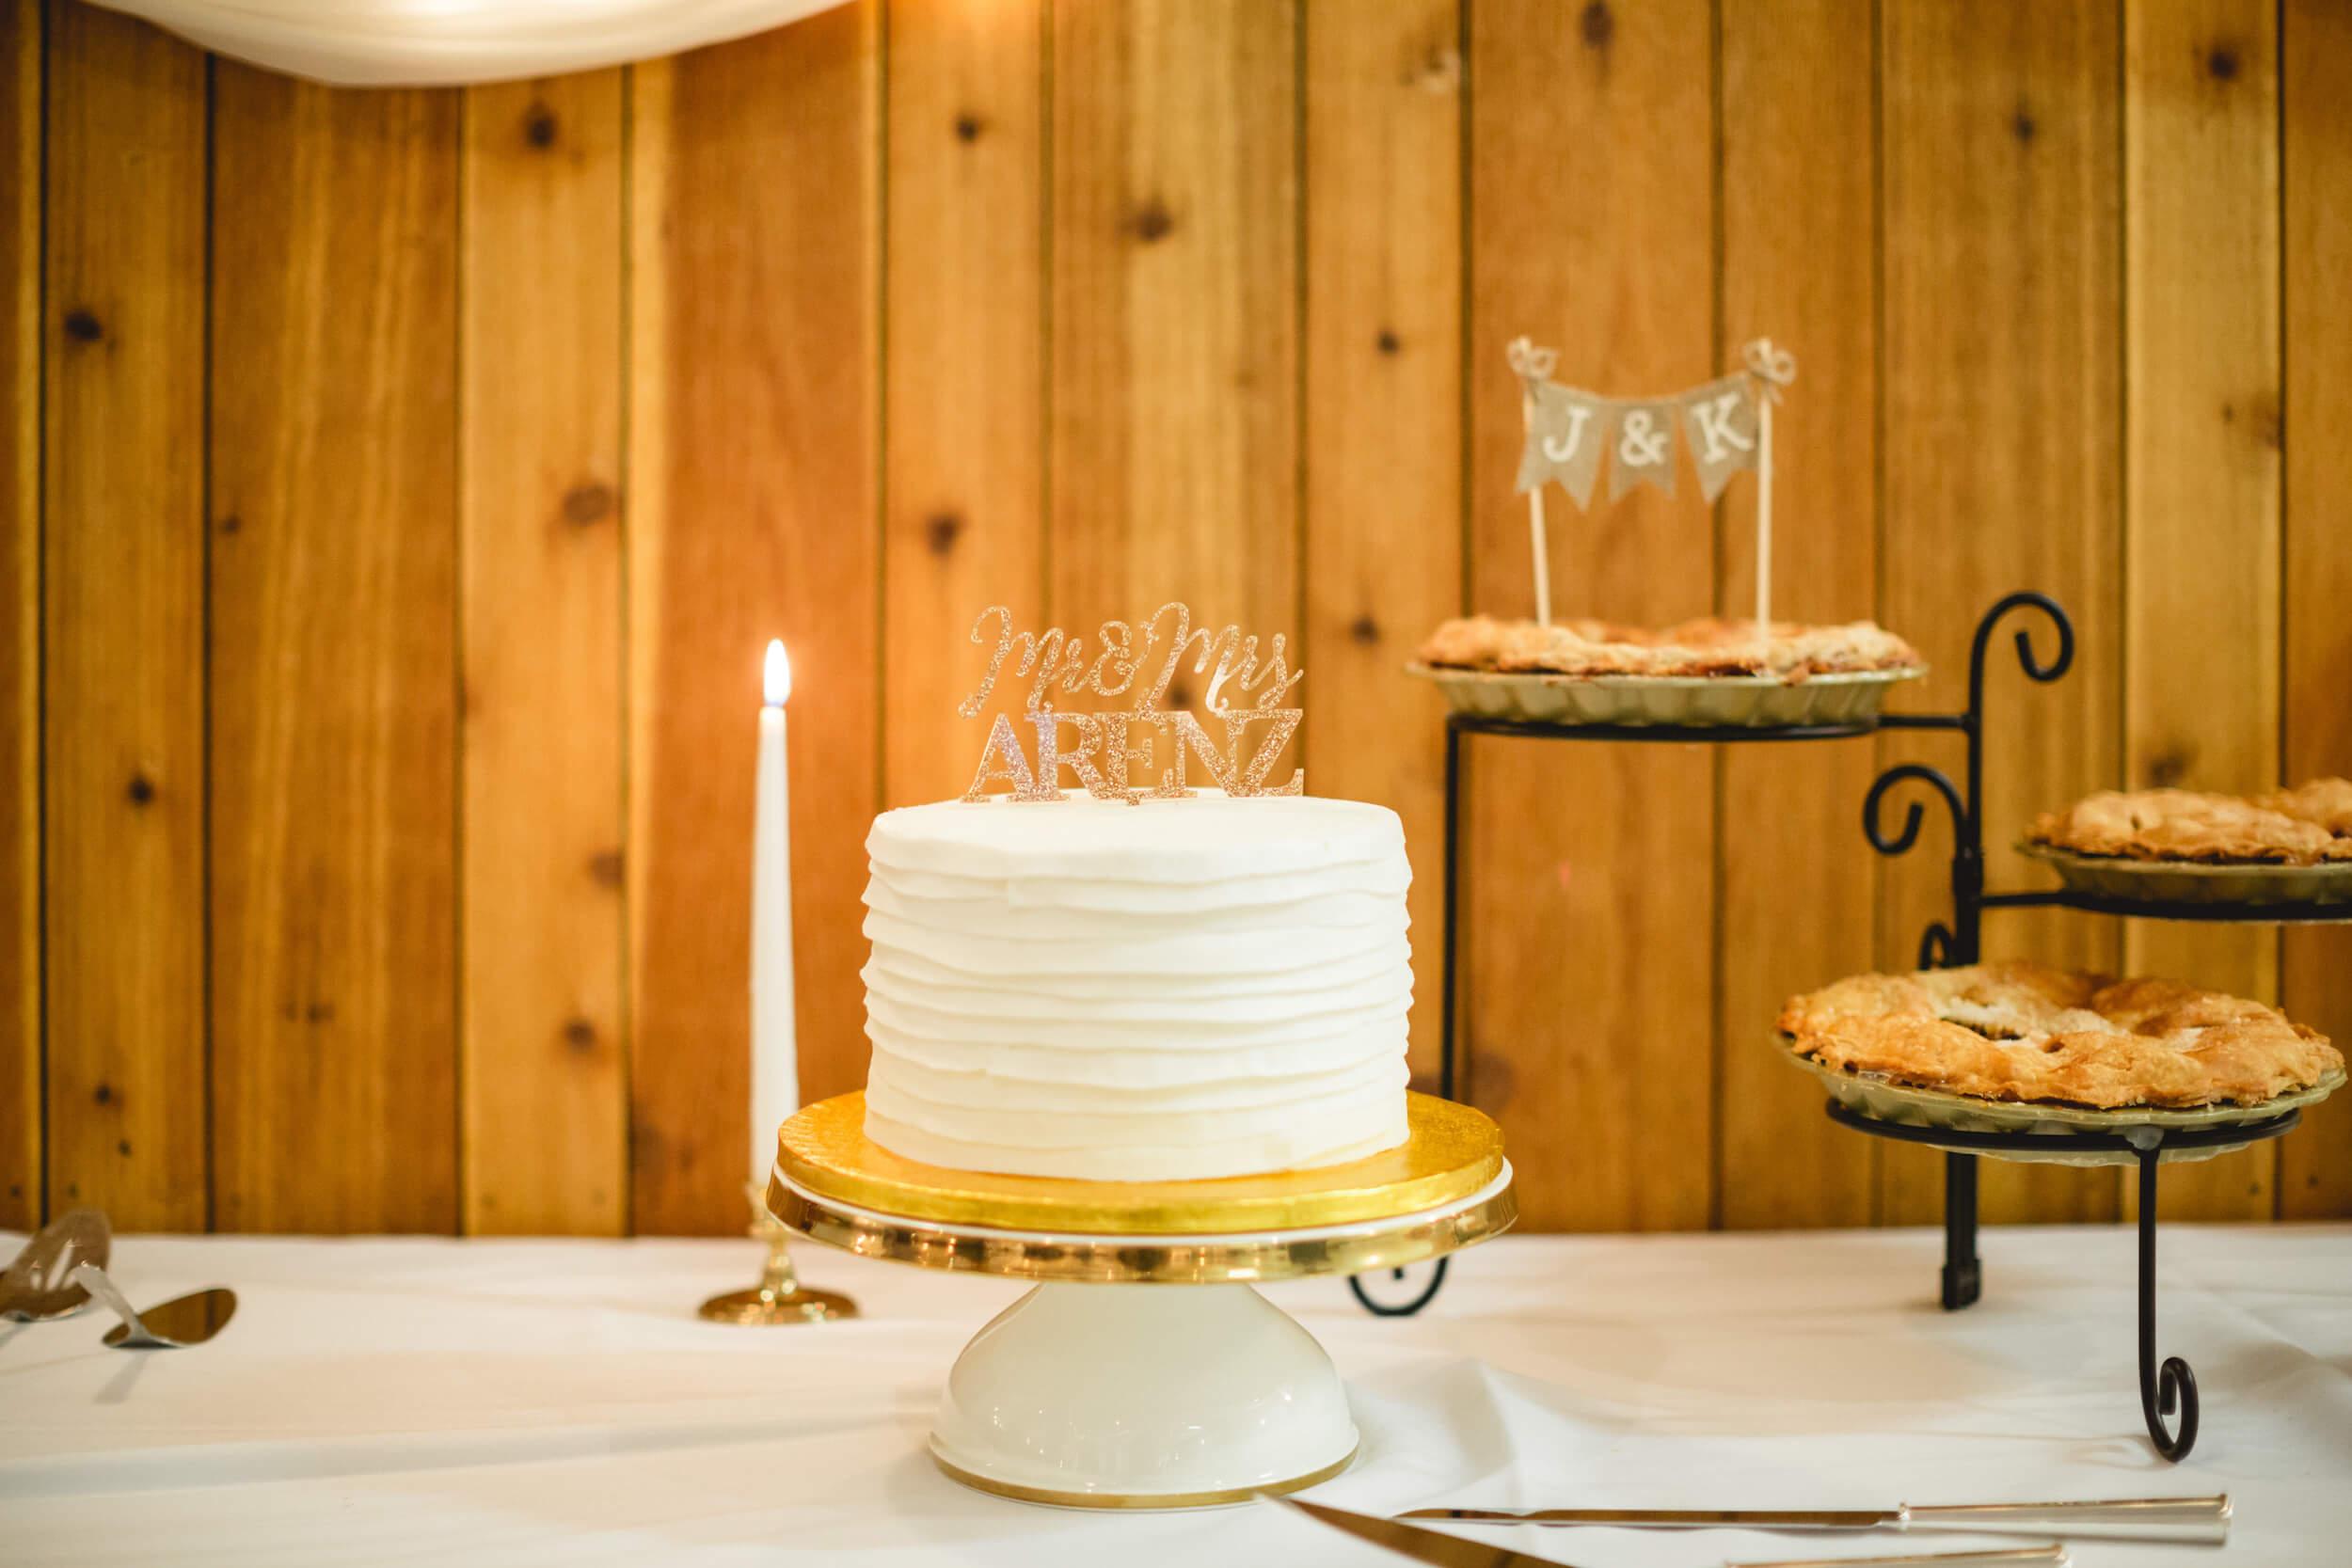 rochelle-louise-photography-acowsay-cinema-wisconsin-wedding-54.jpg